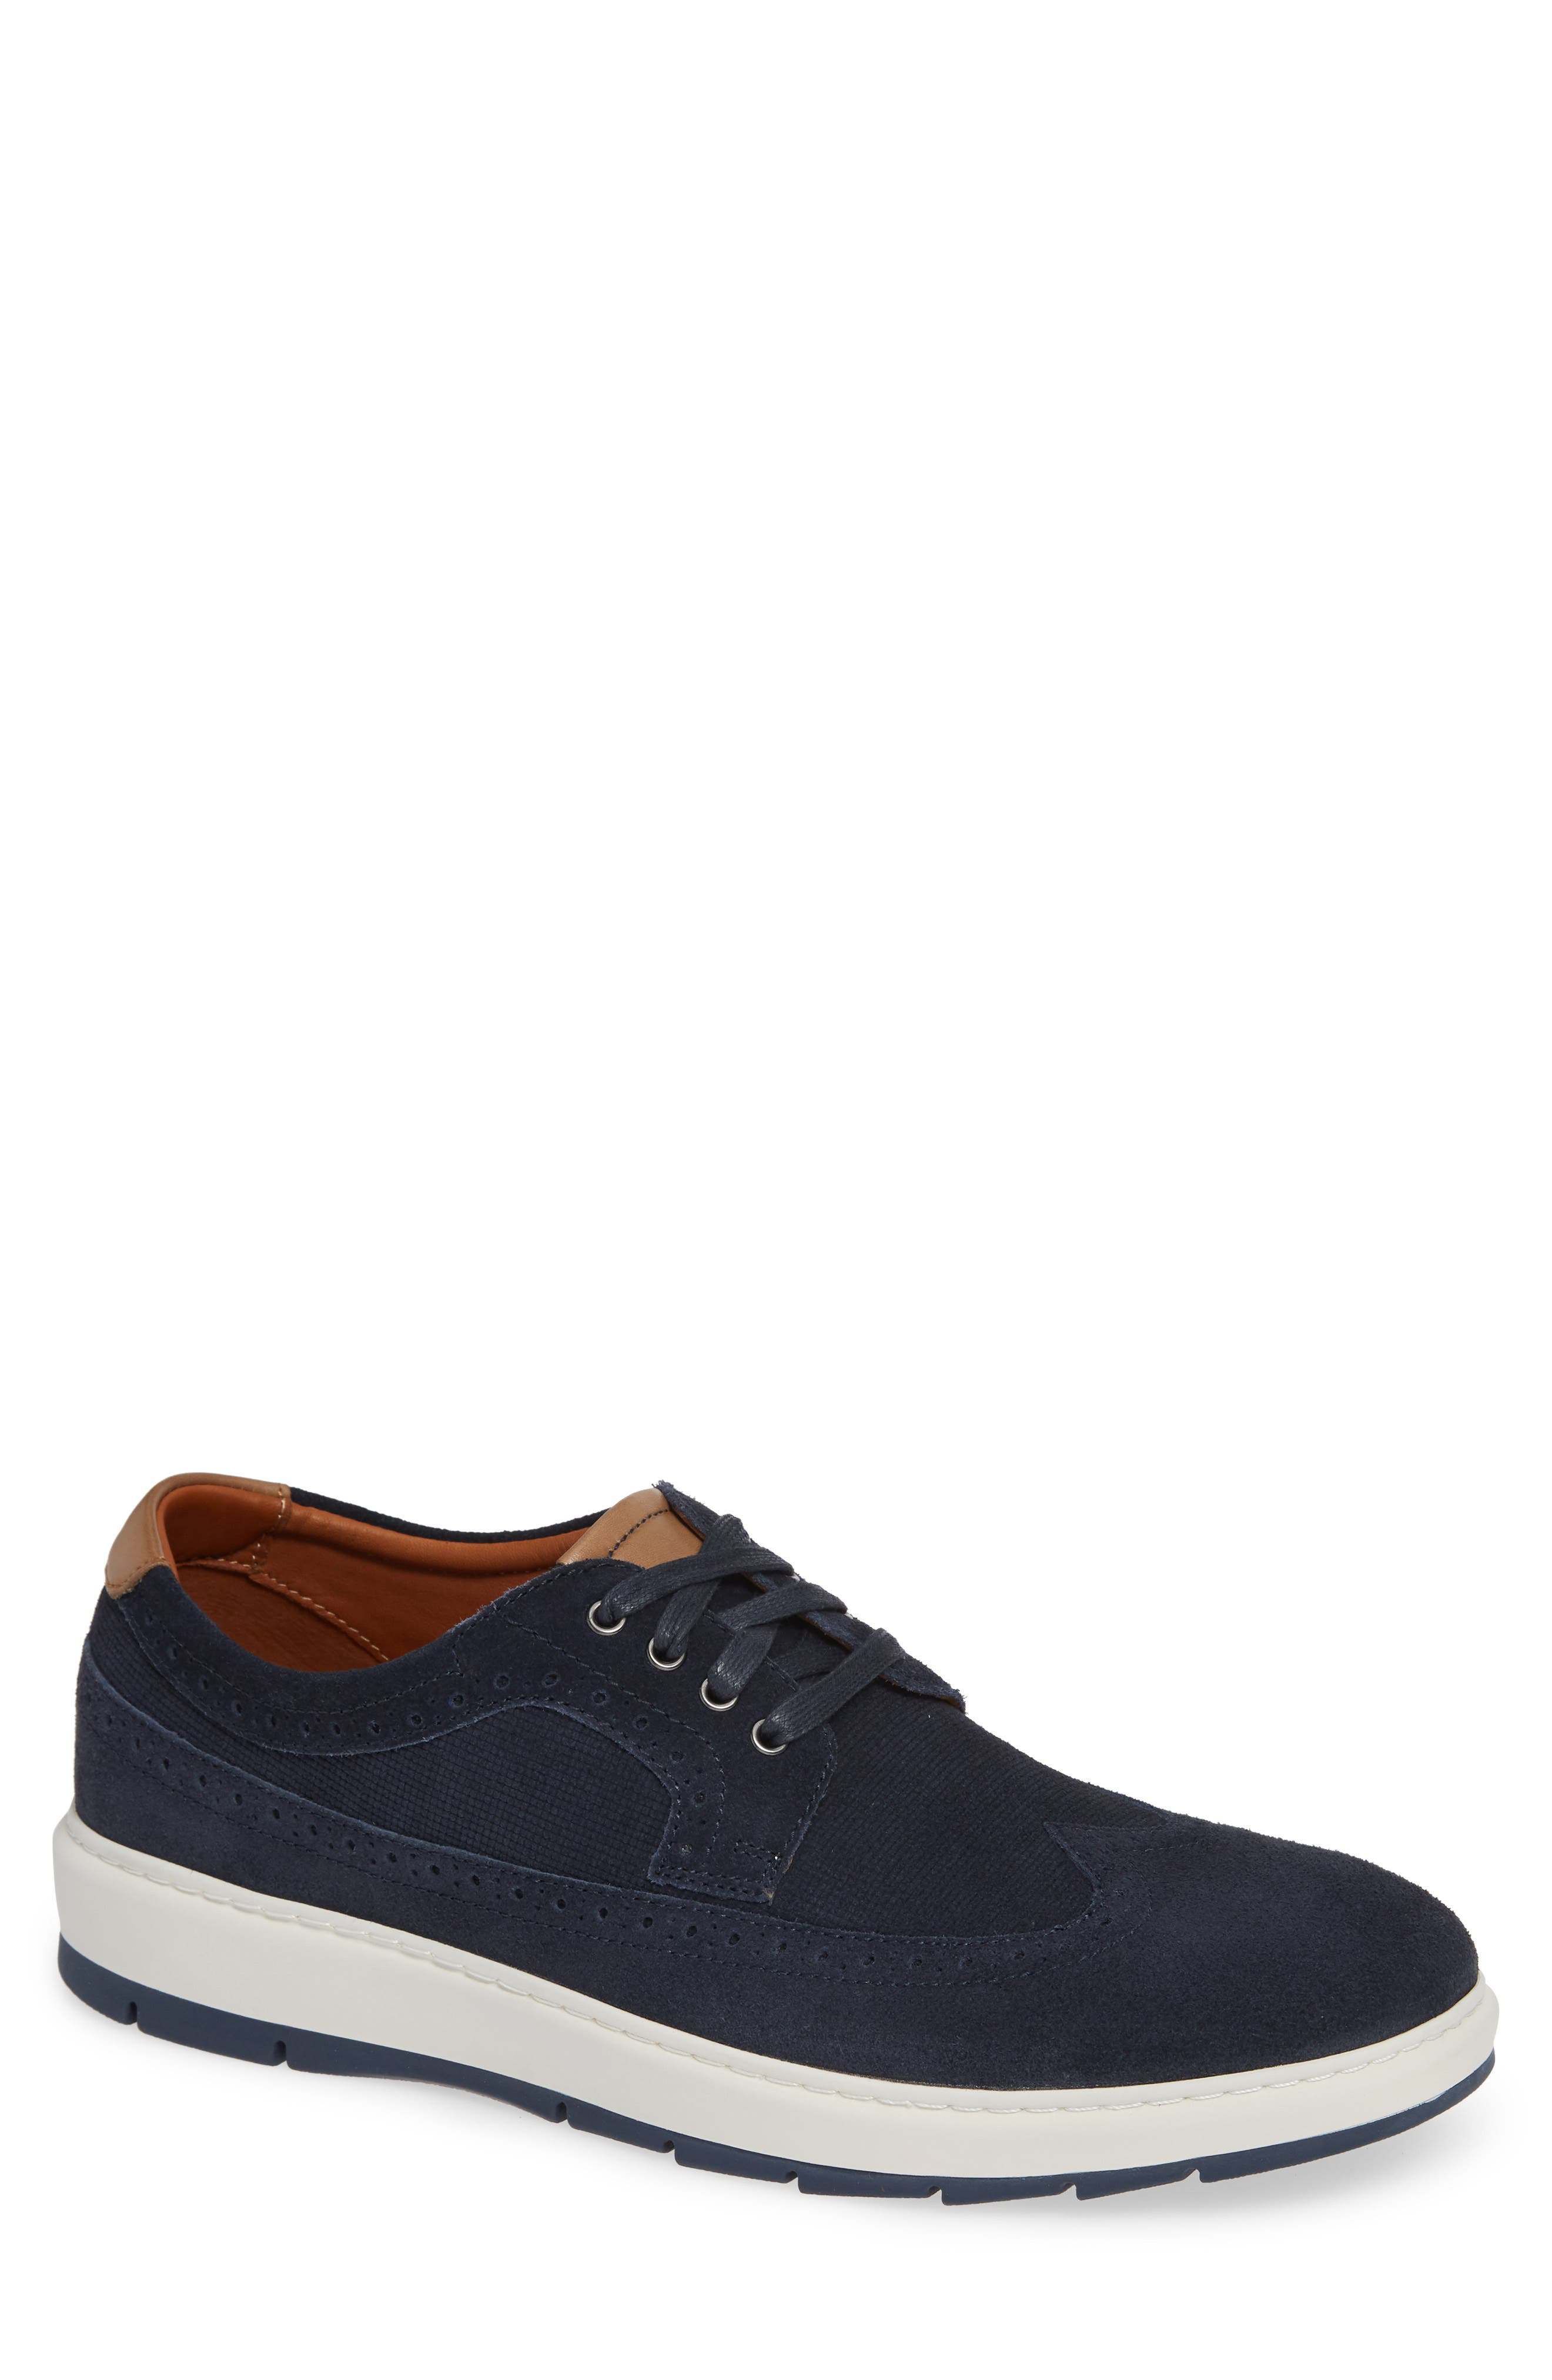 Elliston Wingtip Sneaker,                             Main thumbnail 1, color,                             NAVY SUEDE